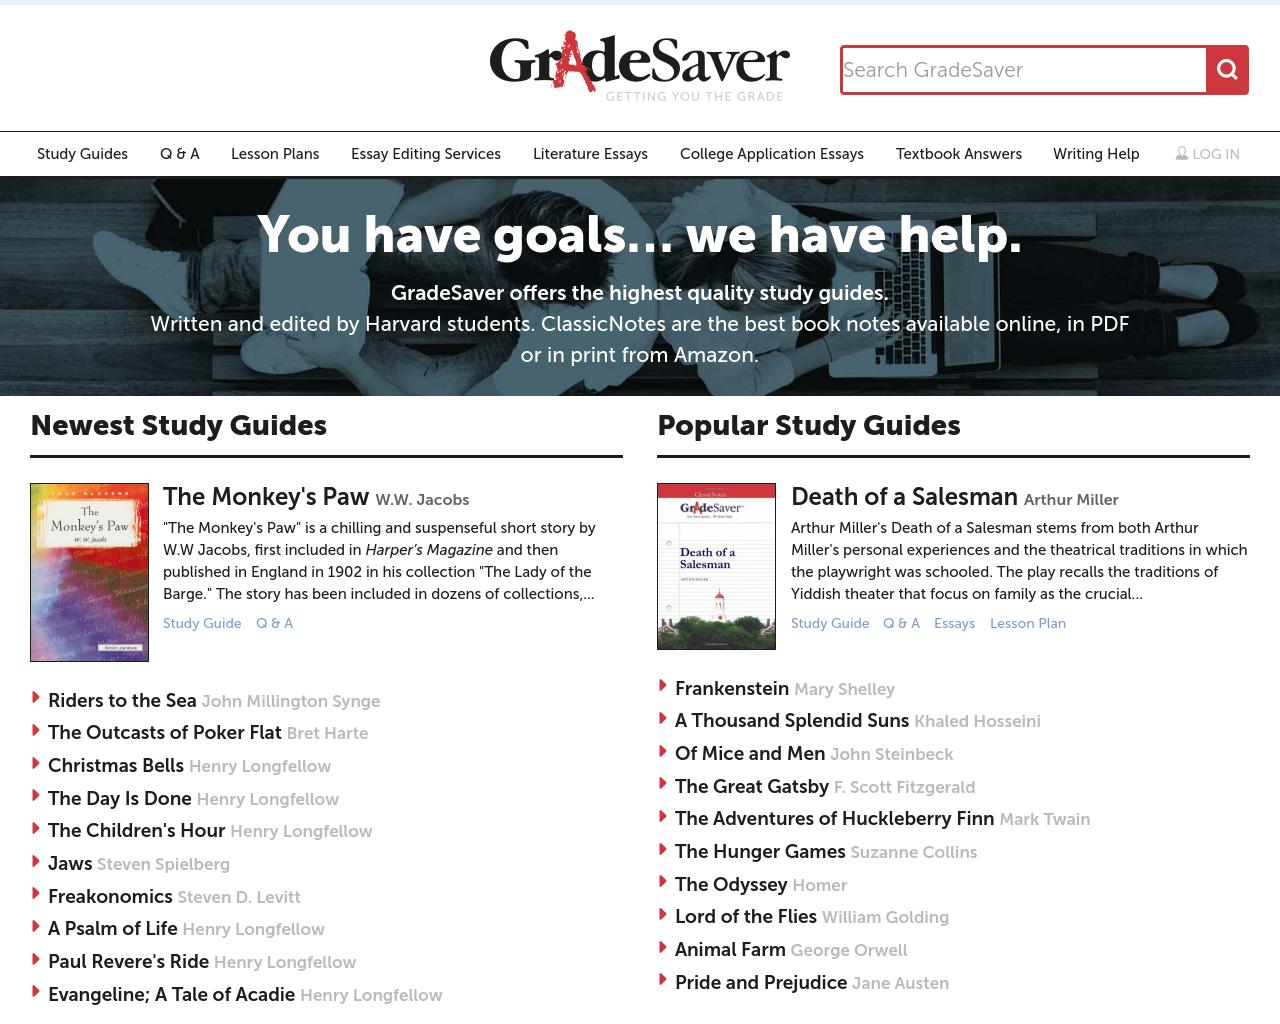 GradeSaver-Advertising-Reviews-Pricing